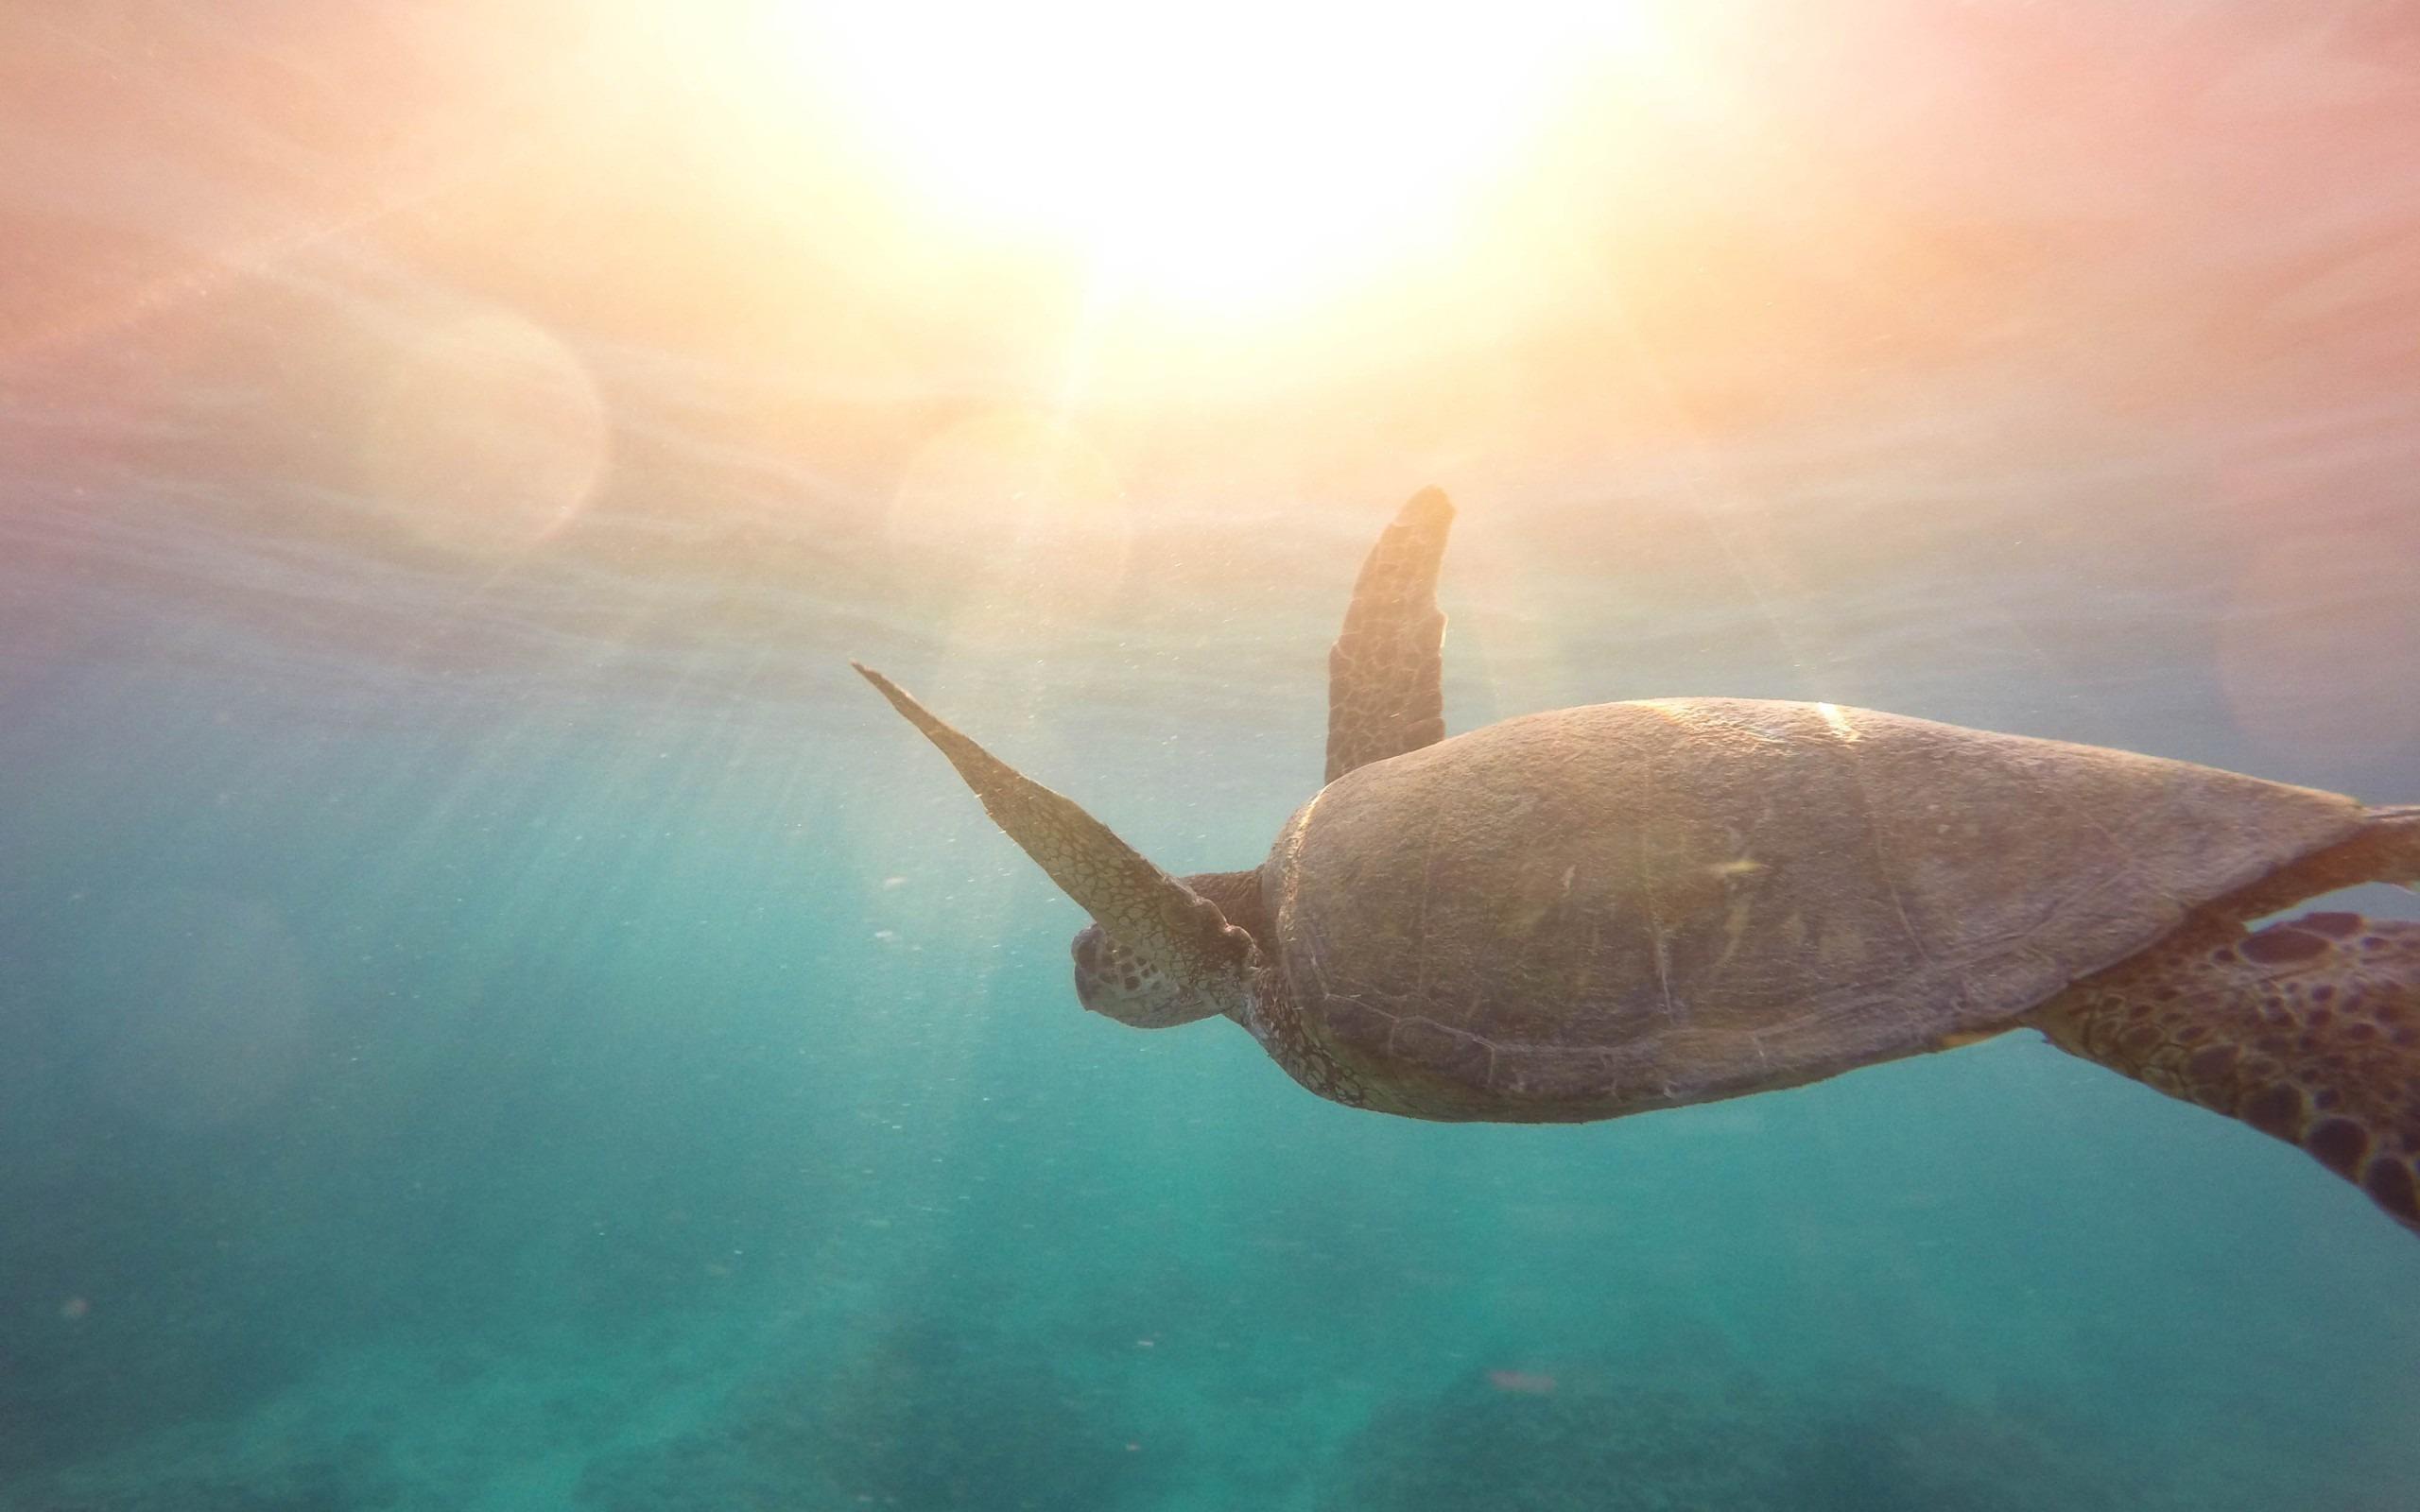 Turtle Underwater 2017 Hd Wallpaper Preview 10wallpaper Com